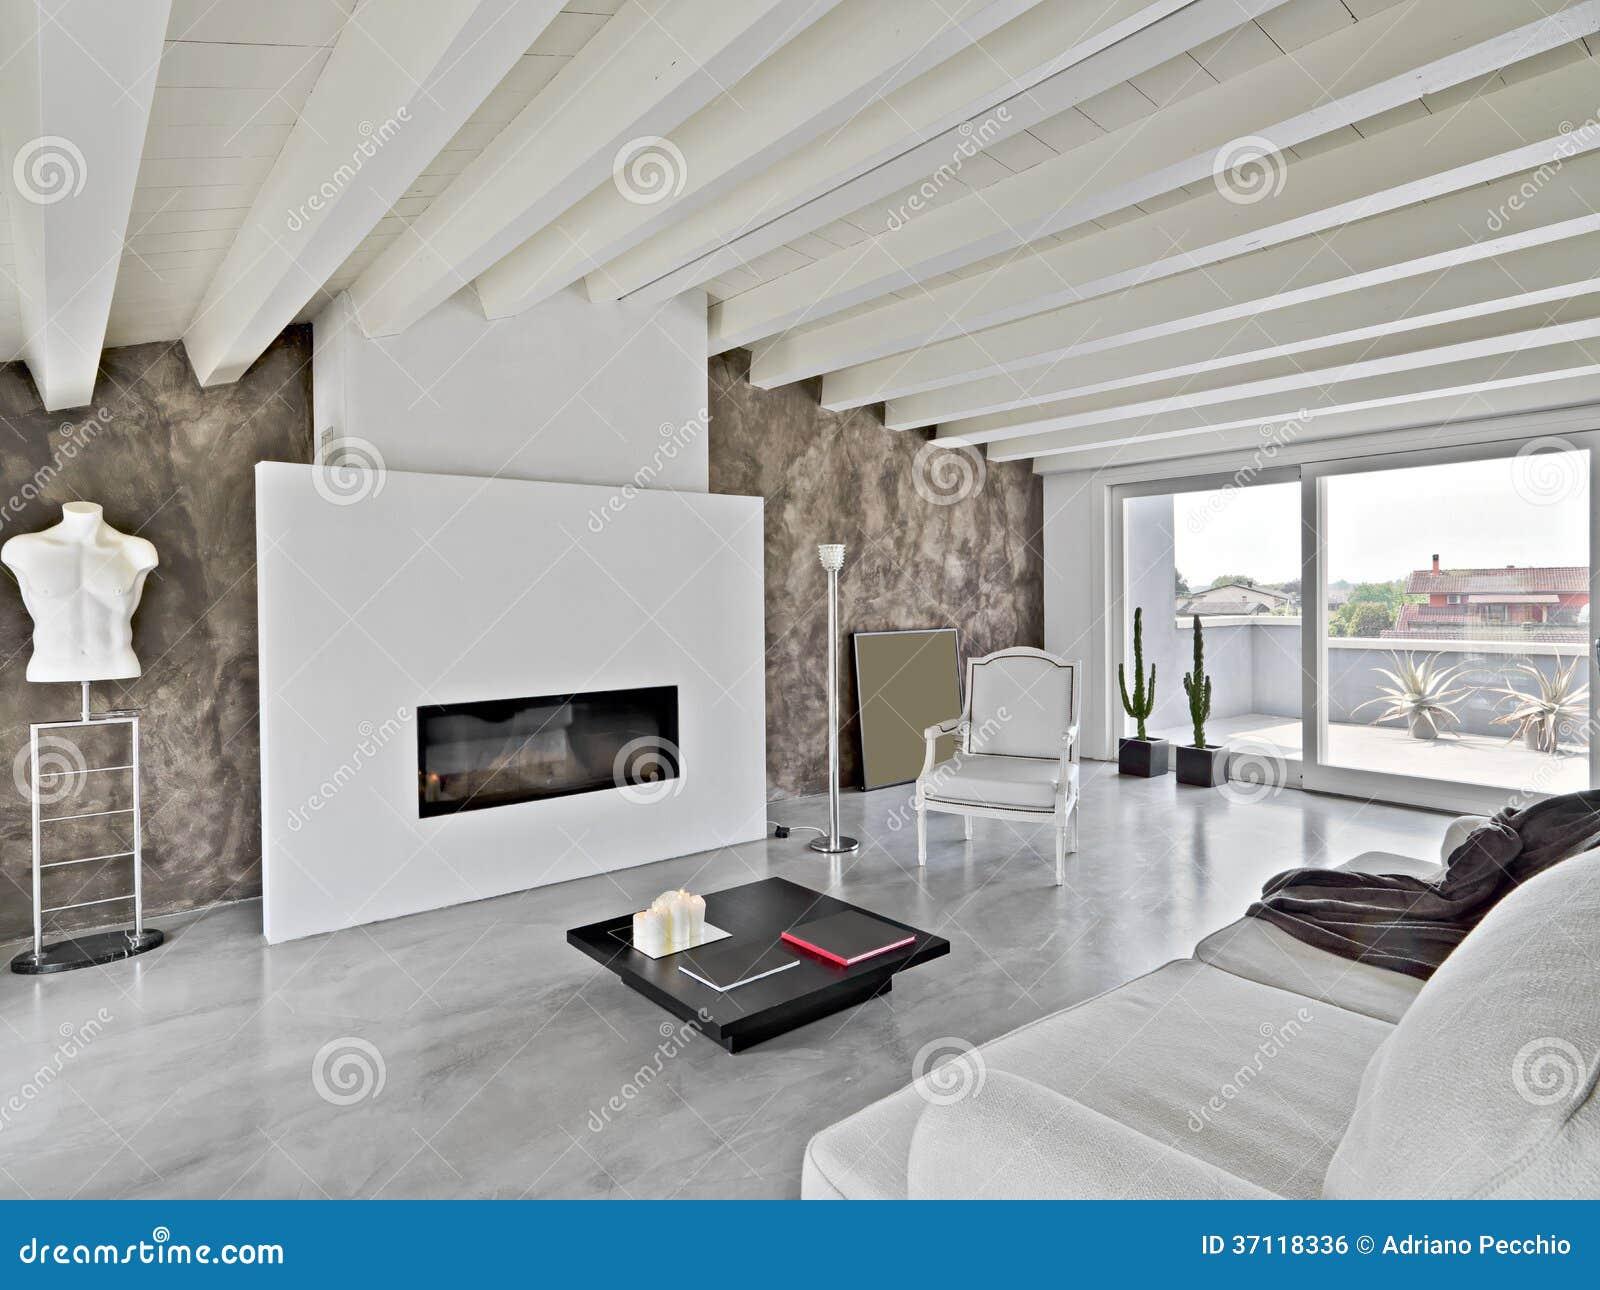 Moderne woonkamer in de zolder royalty vrije stock afbeelding afbeelding 37118336 - Mezzanine woonkamer ...